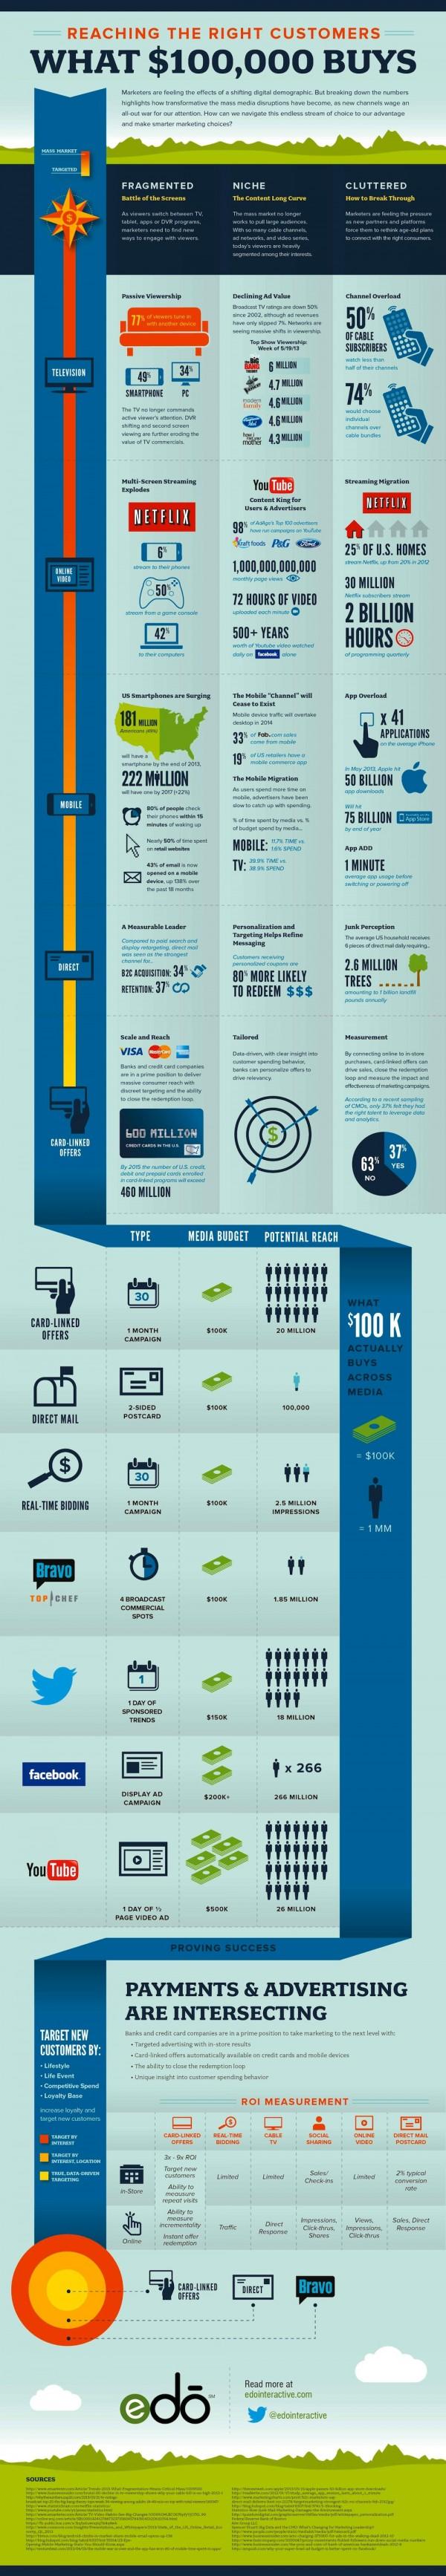 digital-marketing-media-reaching-the-right-customers-what-100k-buys_51e86948609c9-e1374255949645